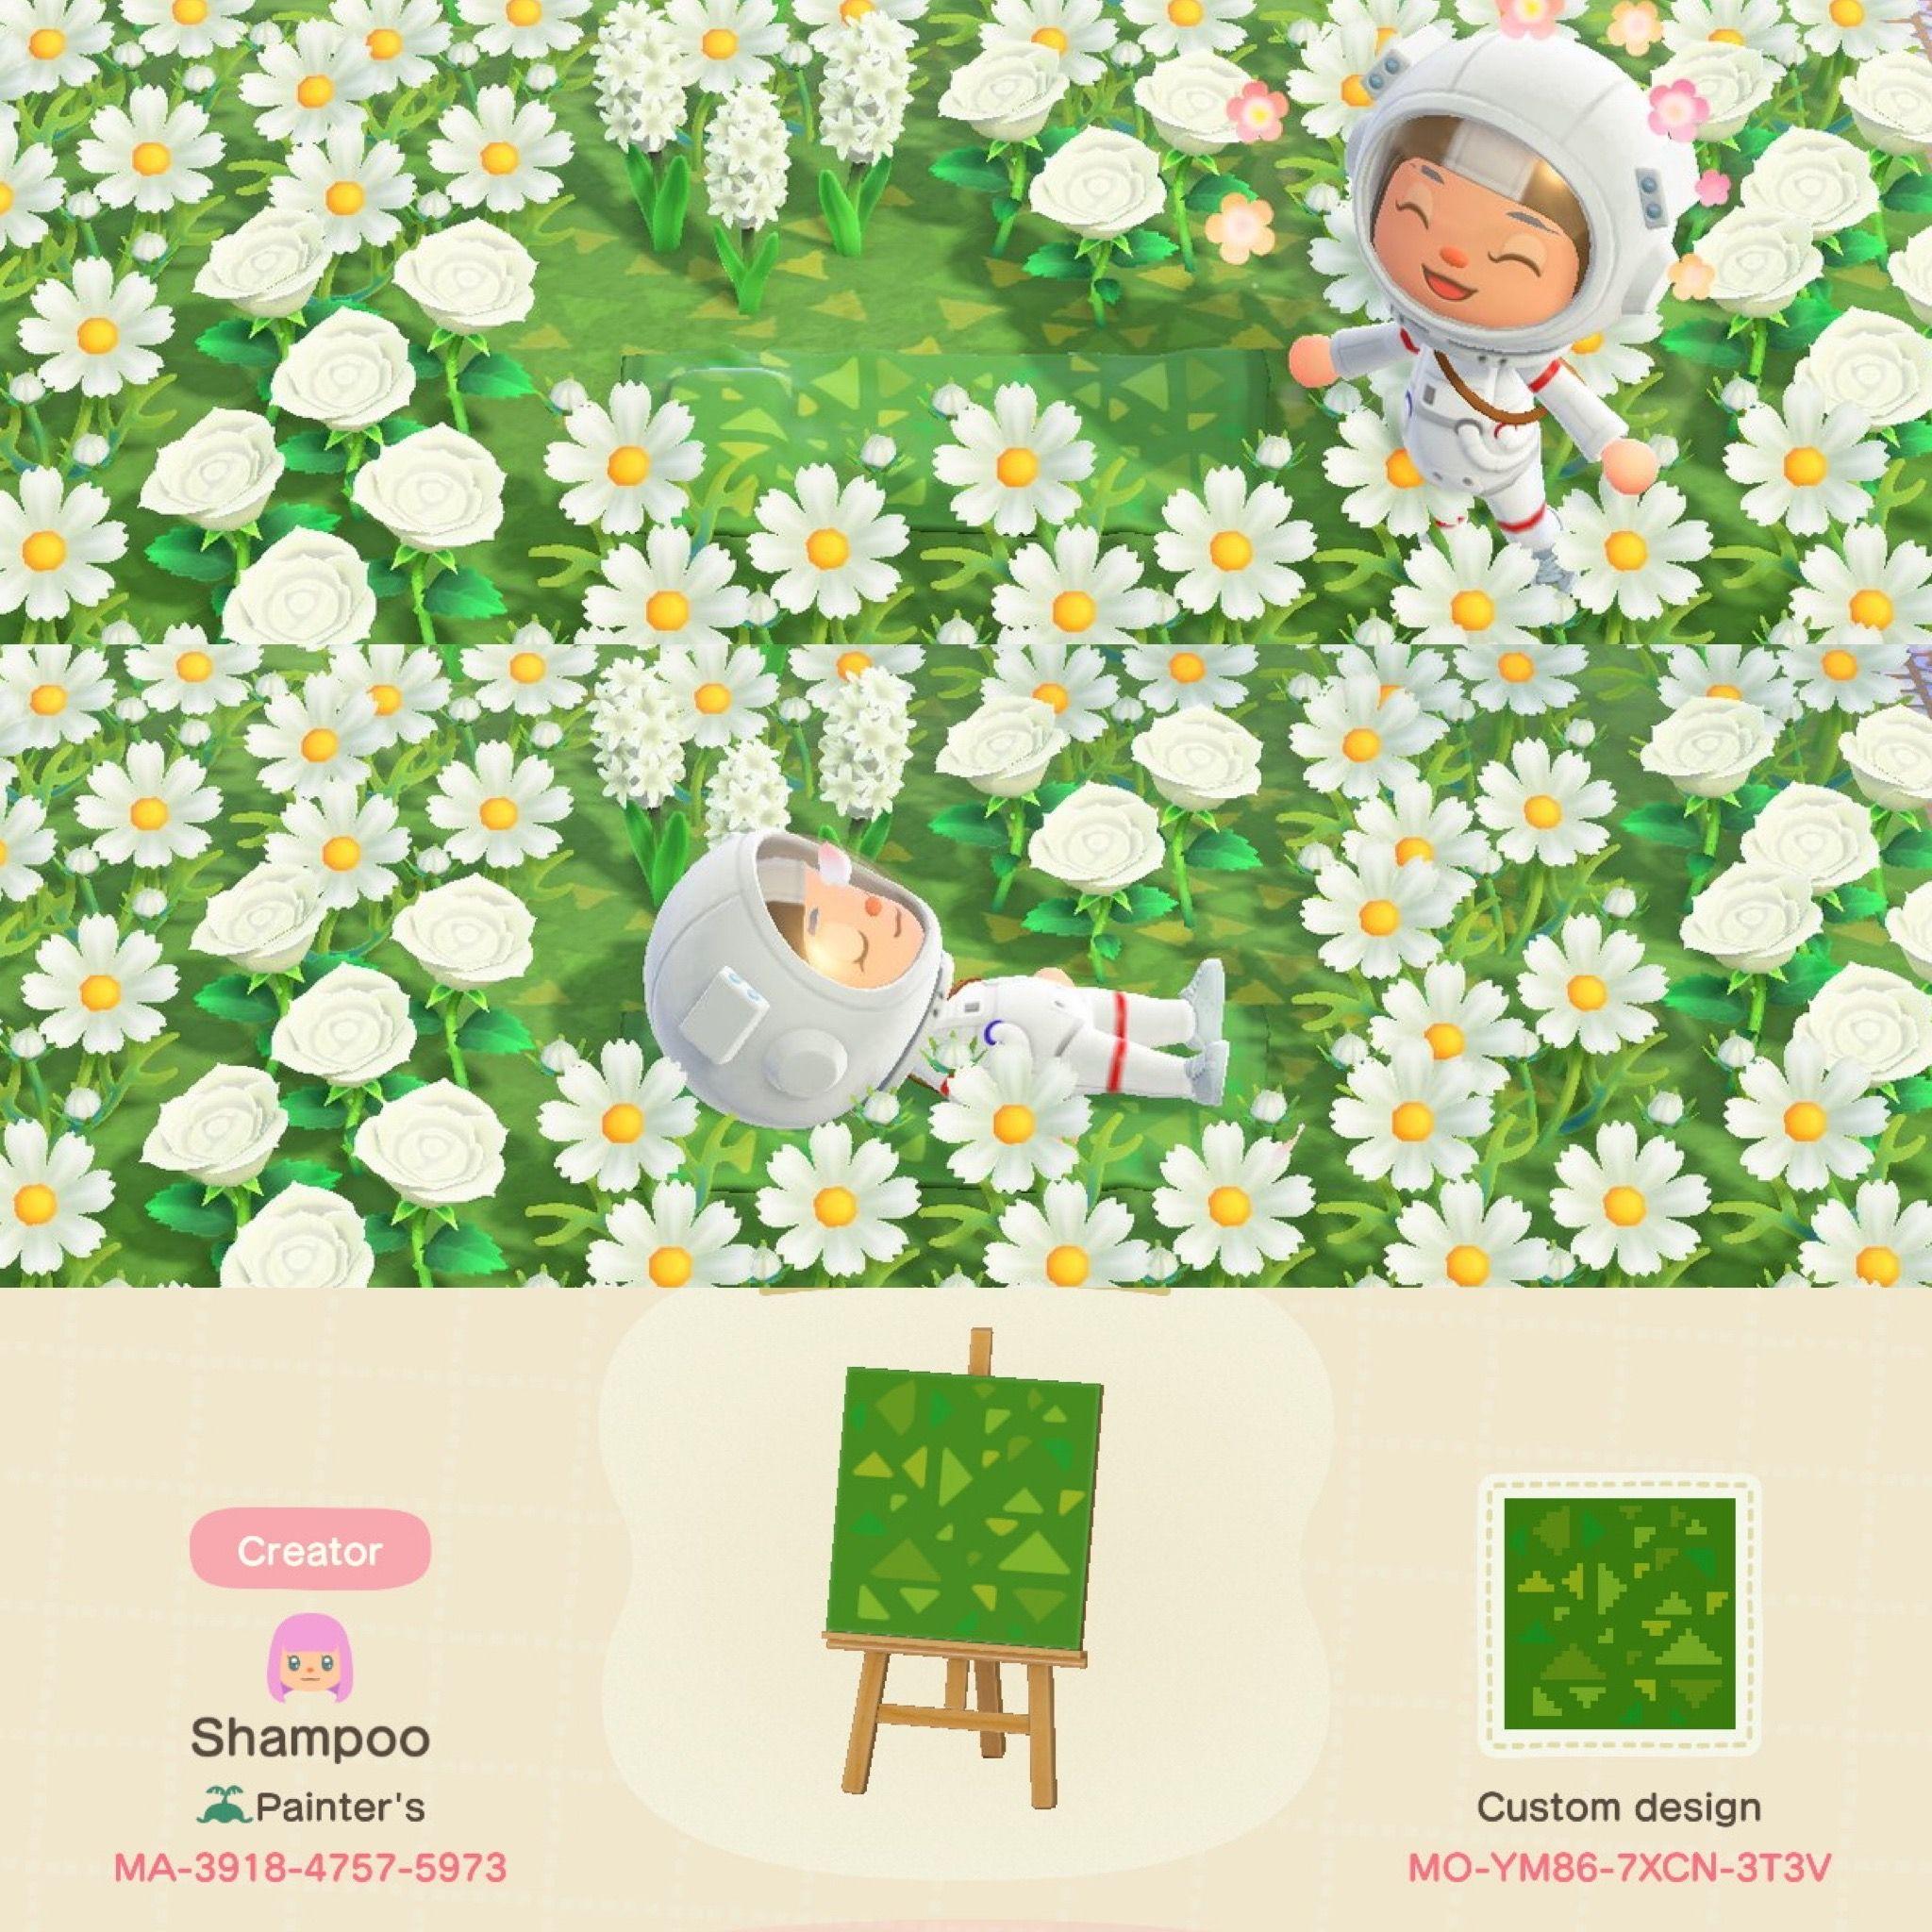 Animal Crossing New Horizons Grass Design in 2020 Animal